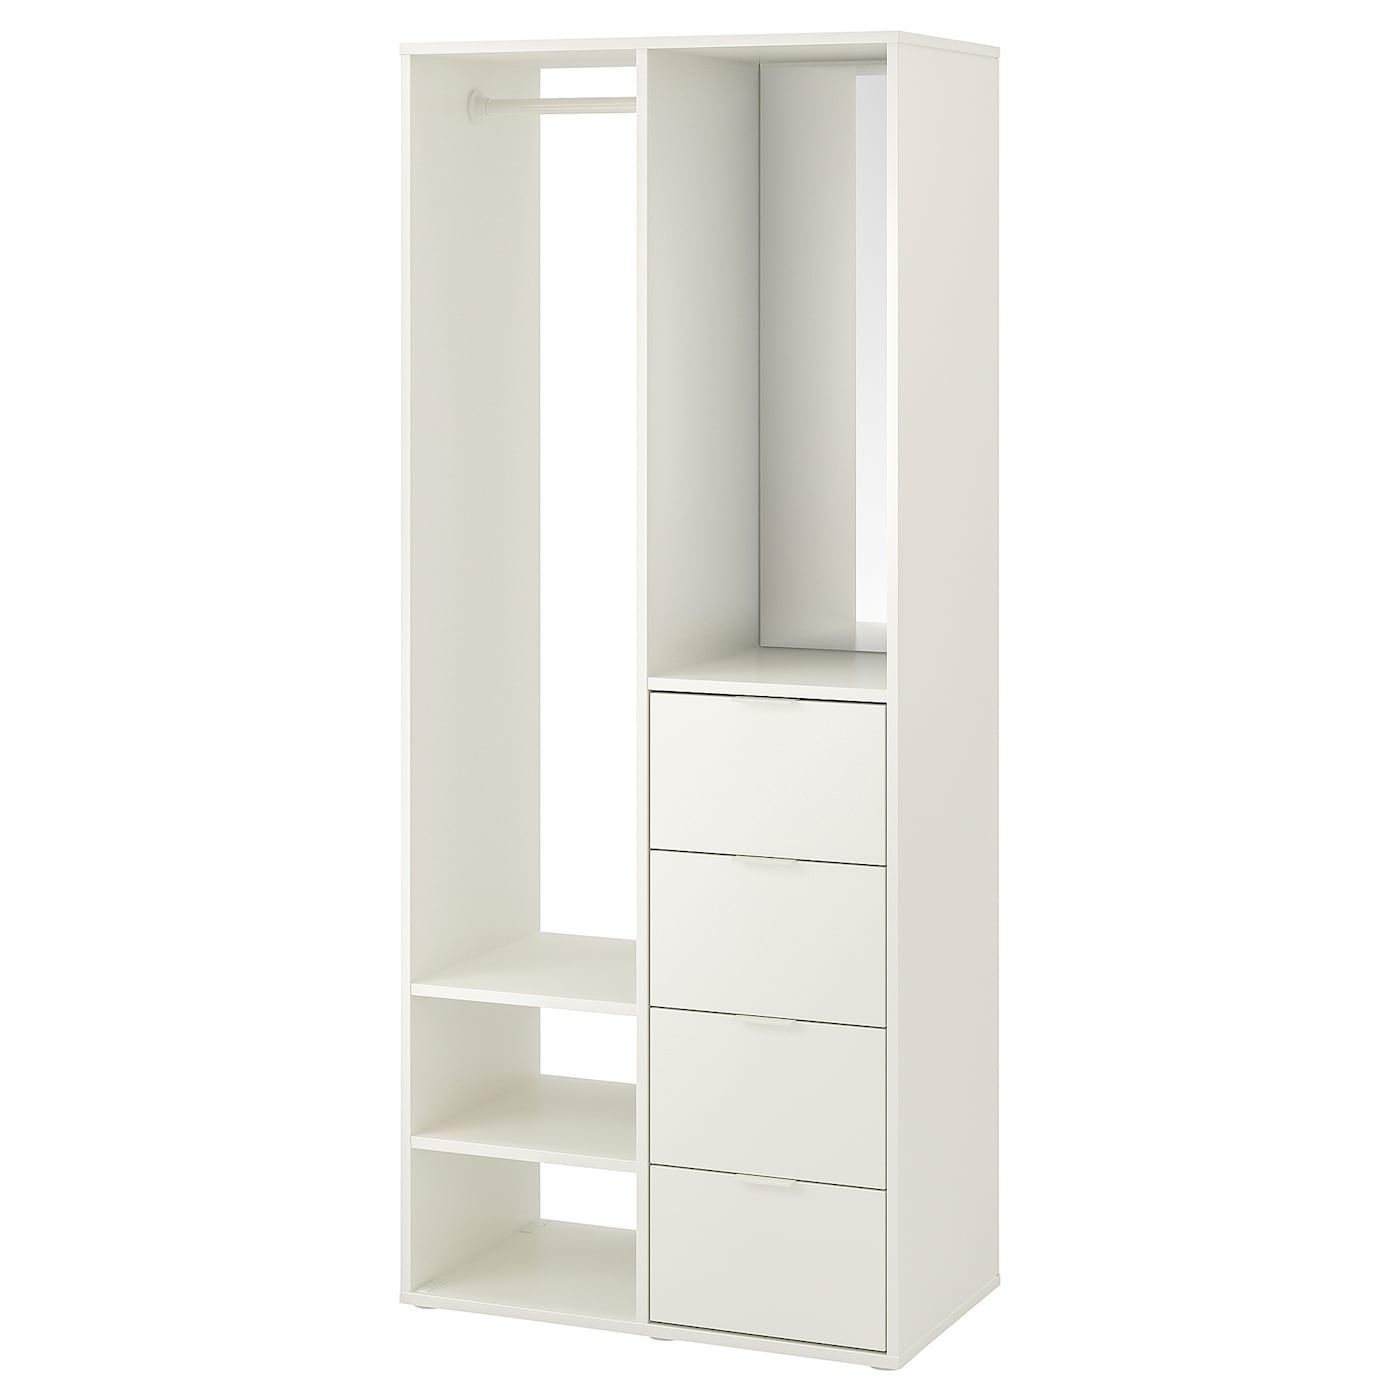 Ikea Sundlandet Open Wardrobe Open Wardrobe Ikea Clothes Rail